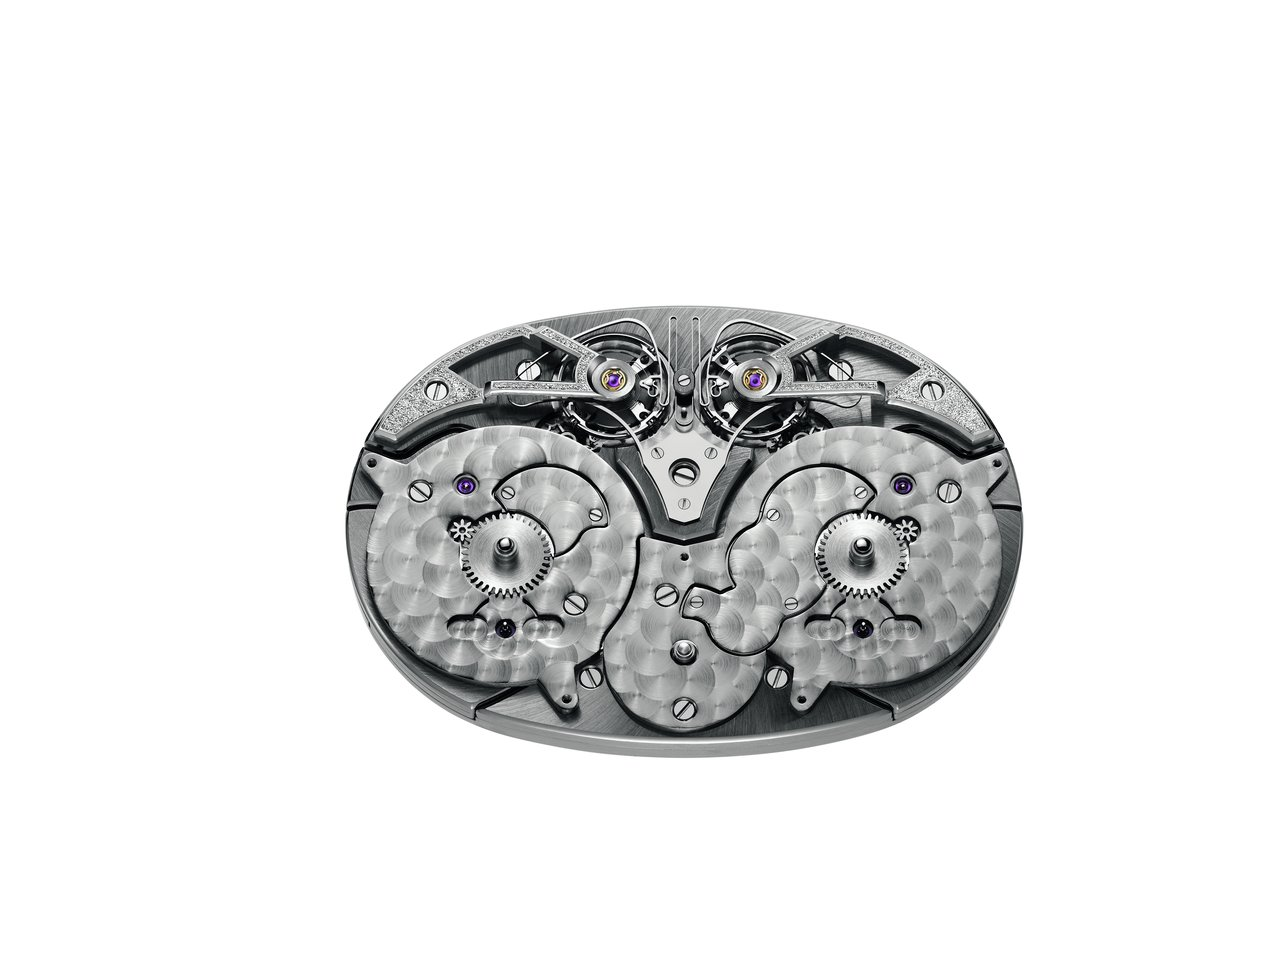 Armin Strom Dual Time Resonance Sapphire movement